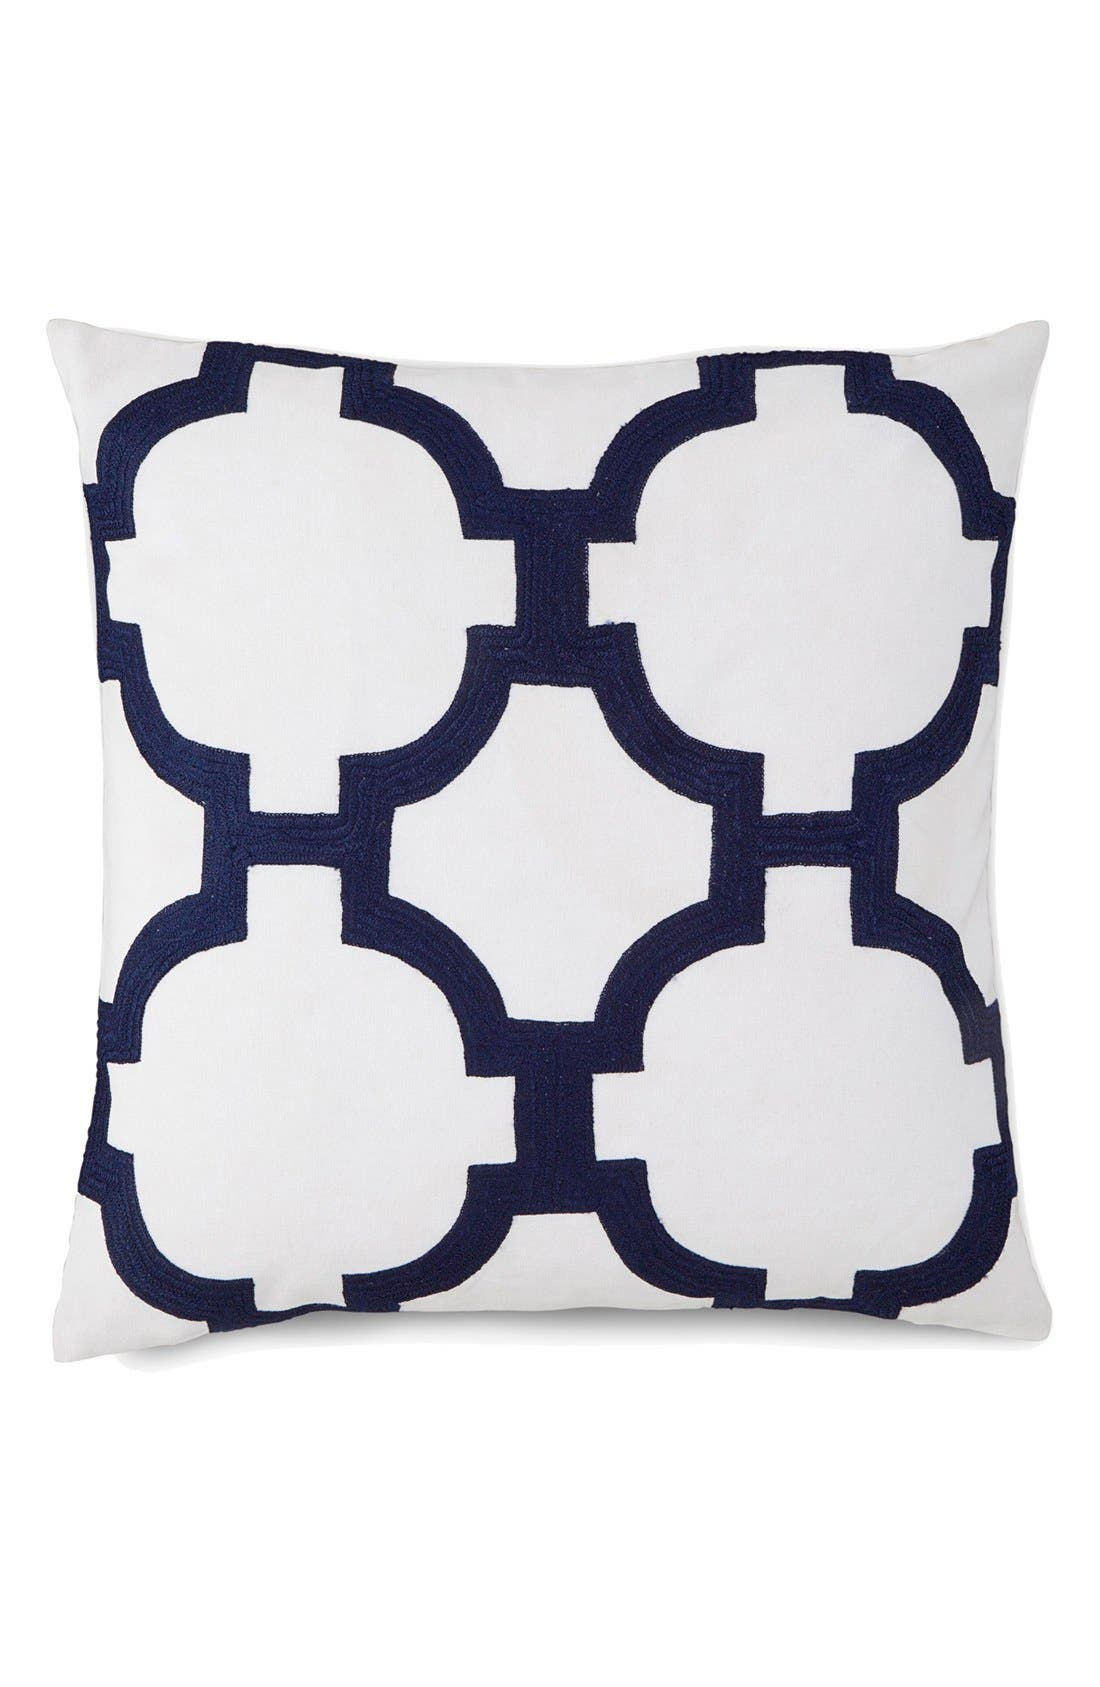 Jill Rosenwald 'Embroidered Links' Pillow